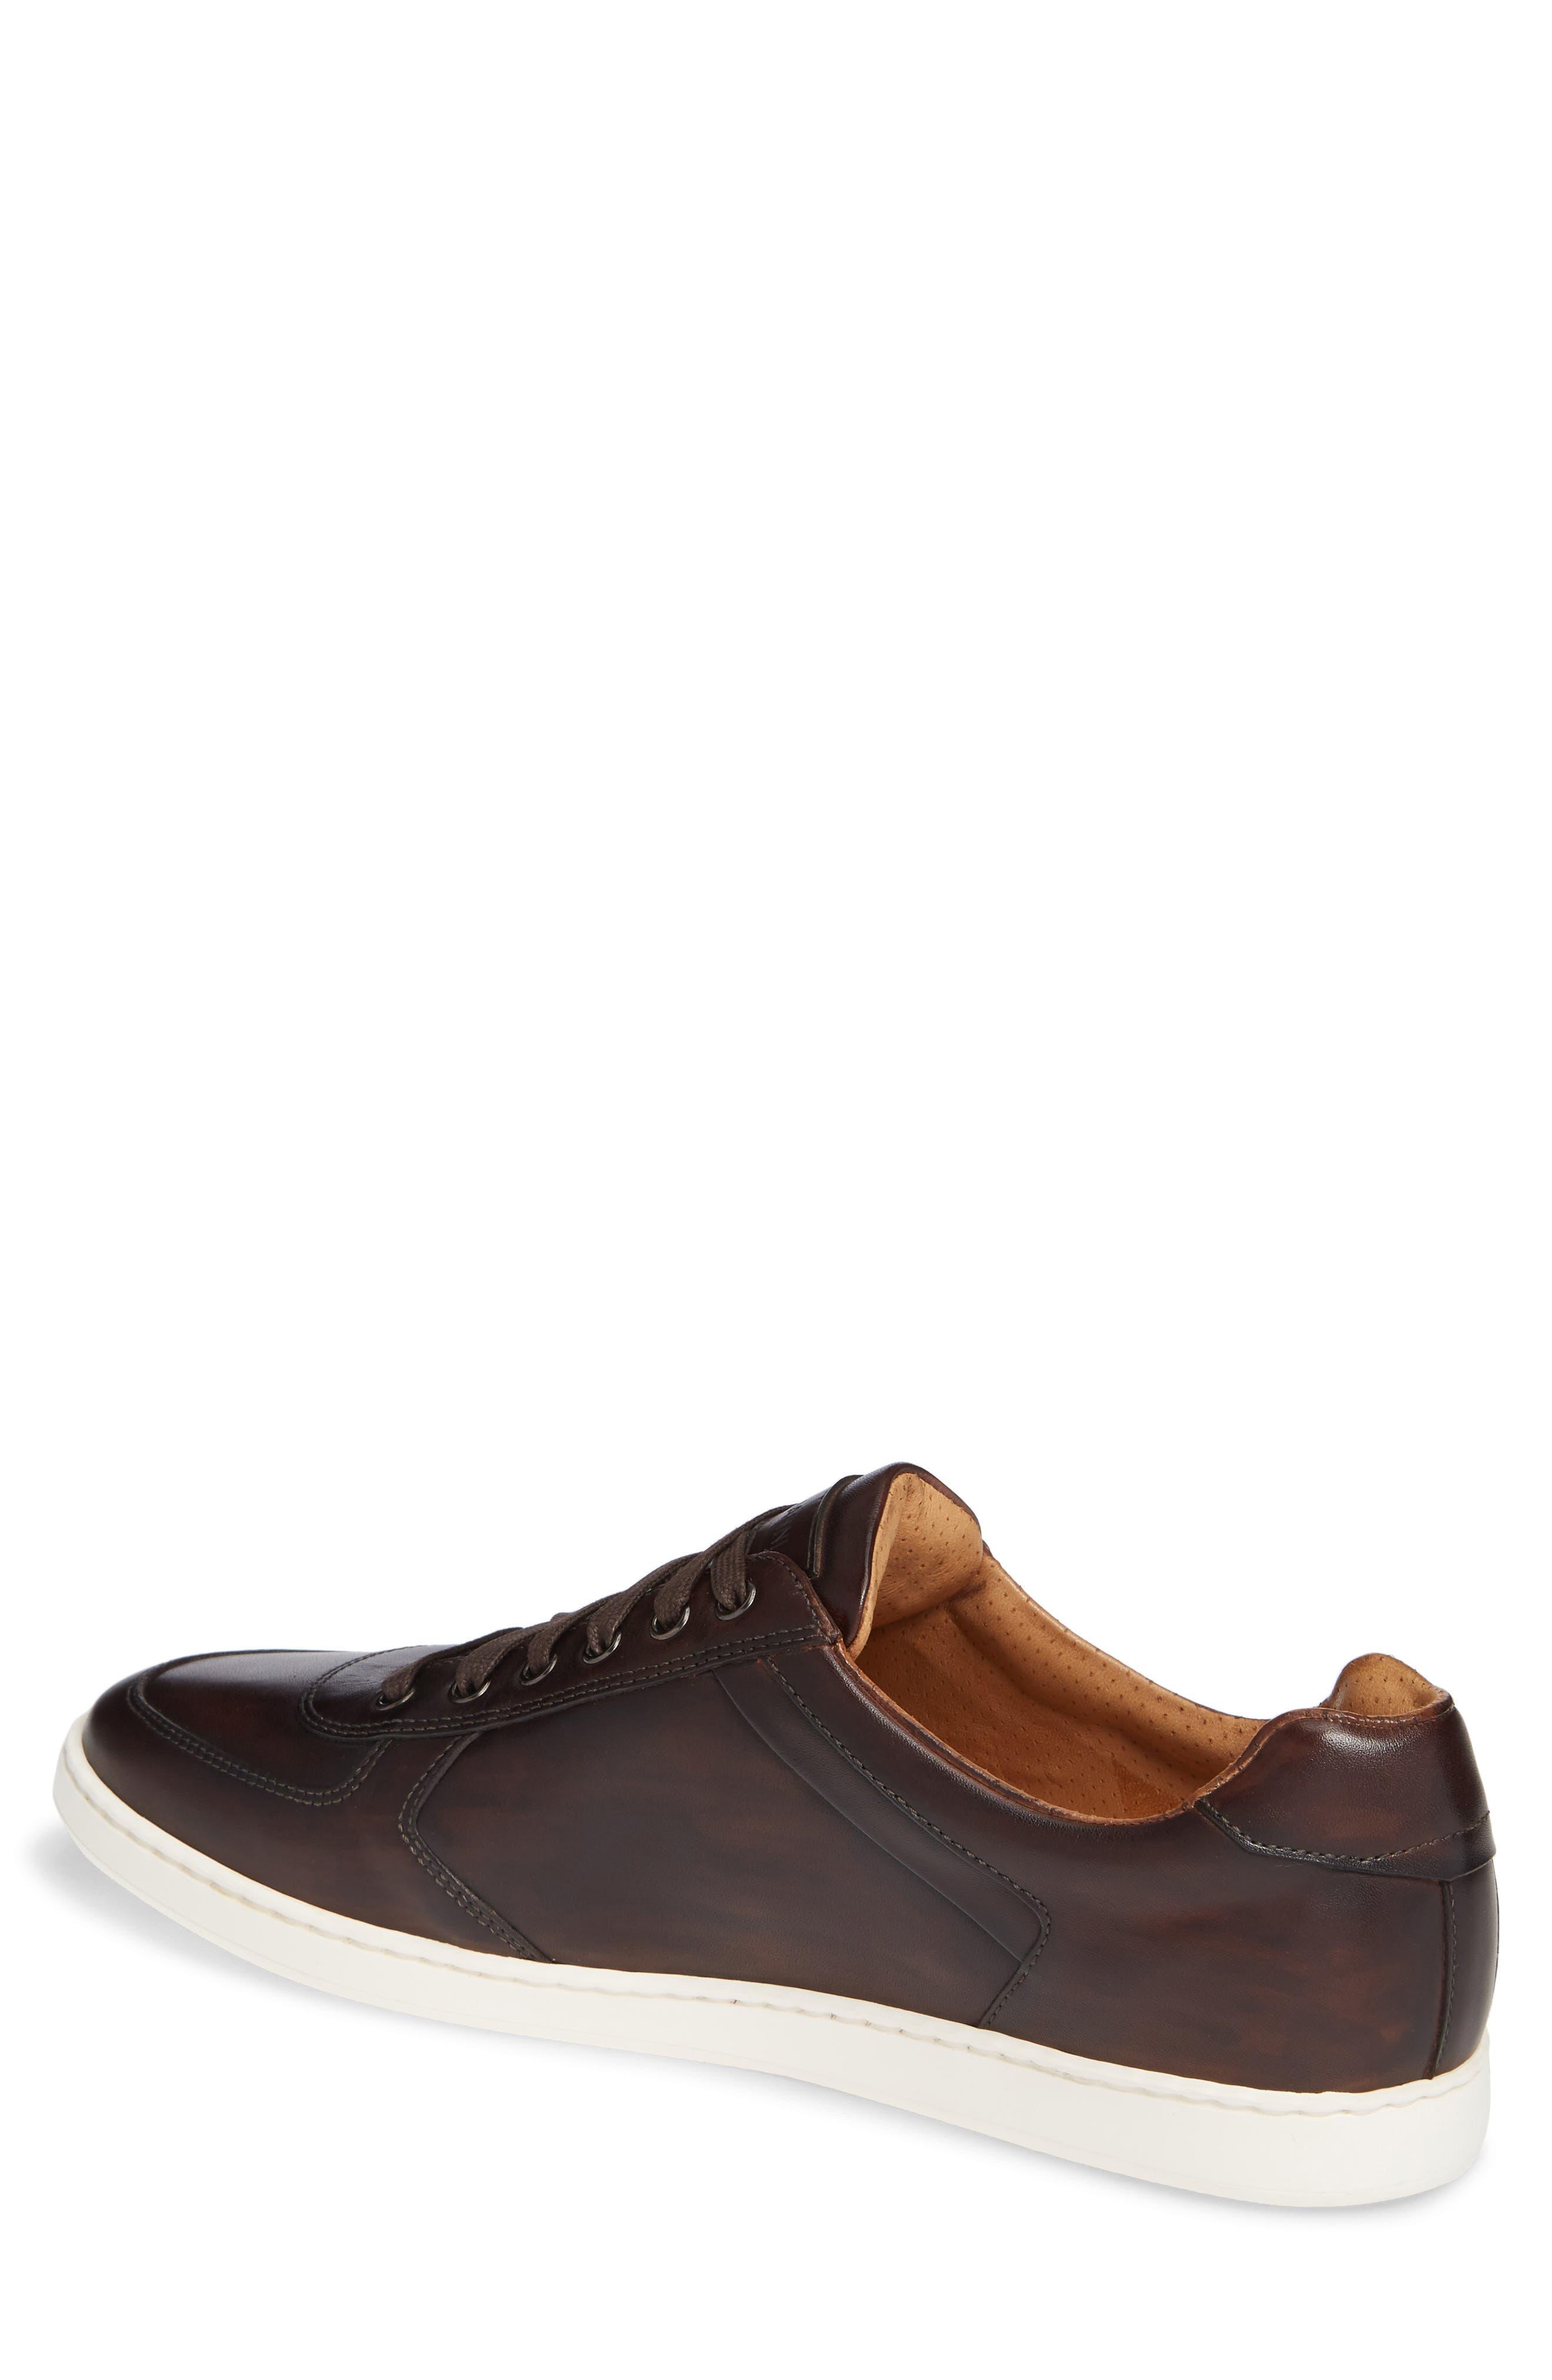 Echo Sneaker,                             Alternate thumbnail 2, color,                             200